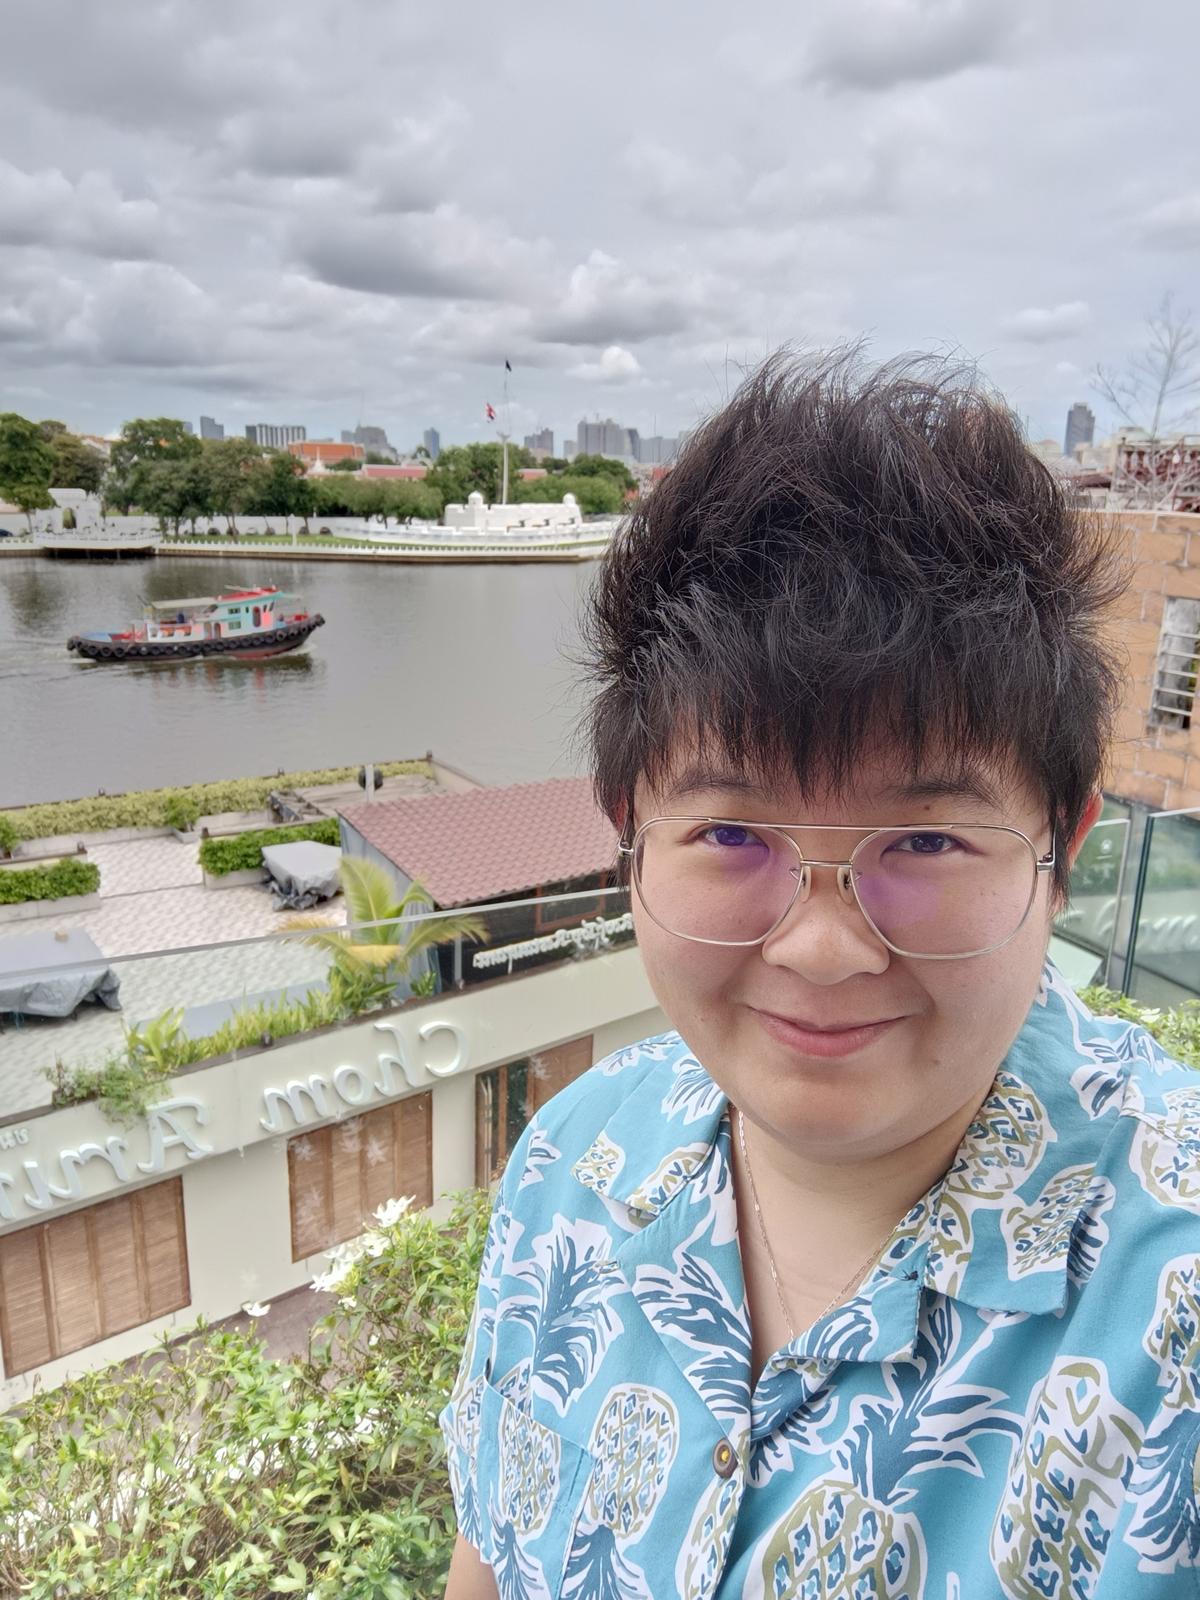 OnePlus Nord 2 5G Selfie